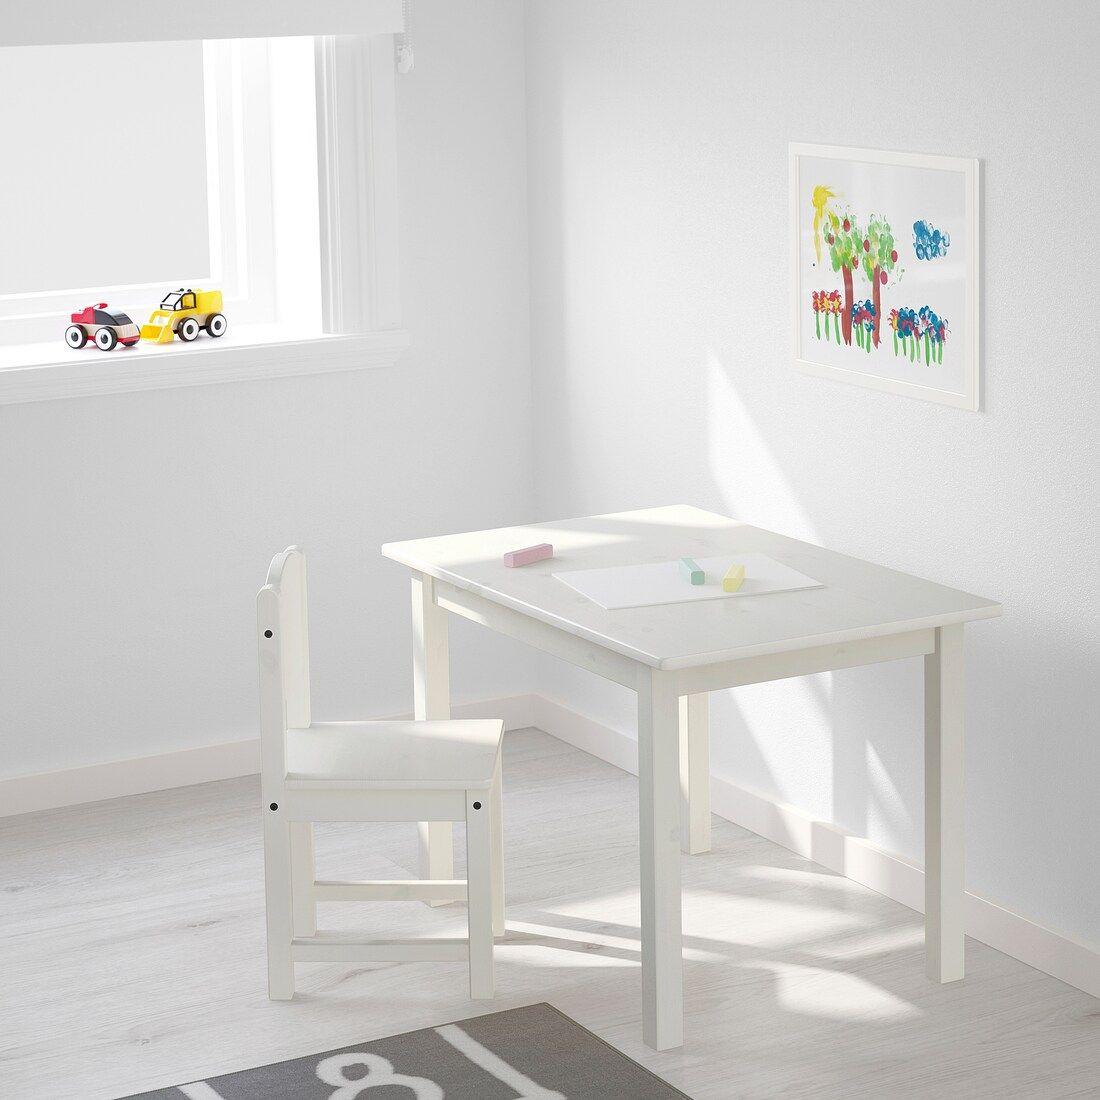 Sundvik Kindertisch Weiss Ikea Deutschland In 2020 Kindertisch Ikea Stuhle Fur Kinder